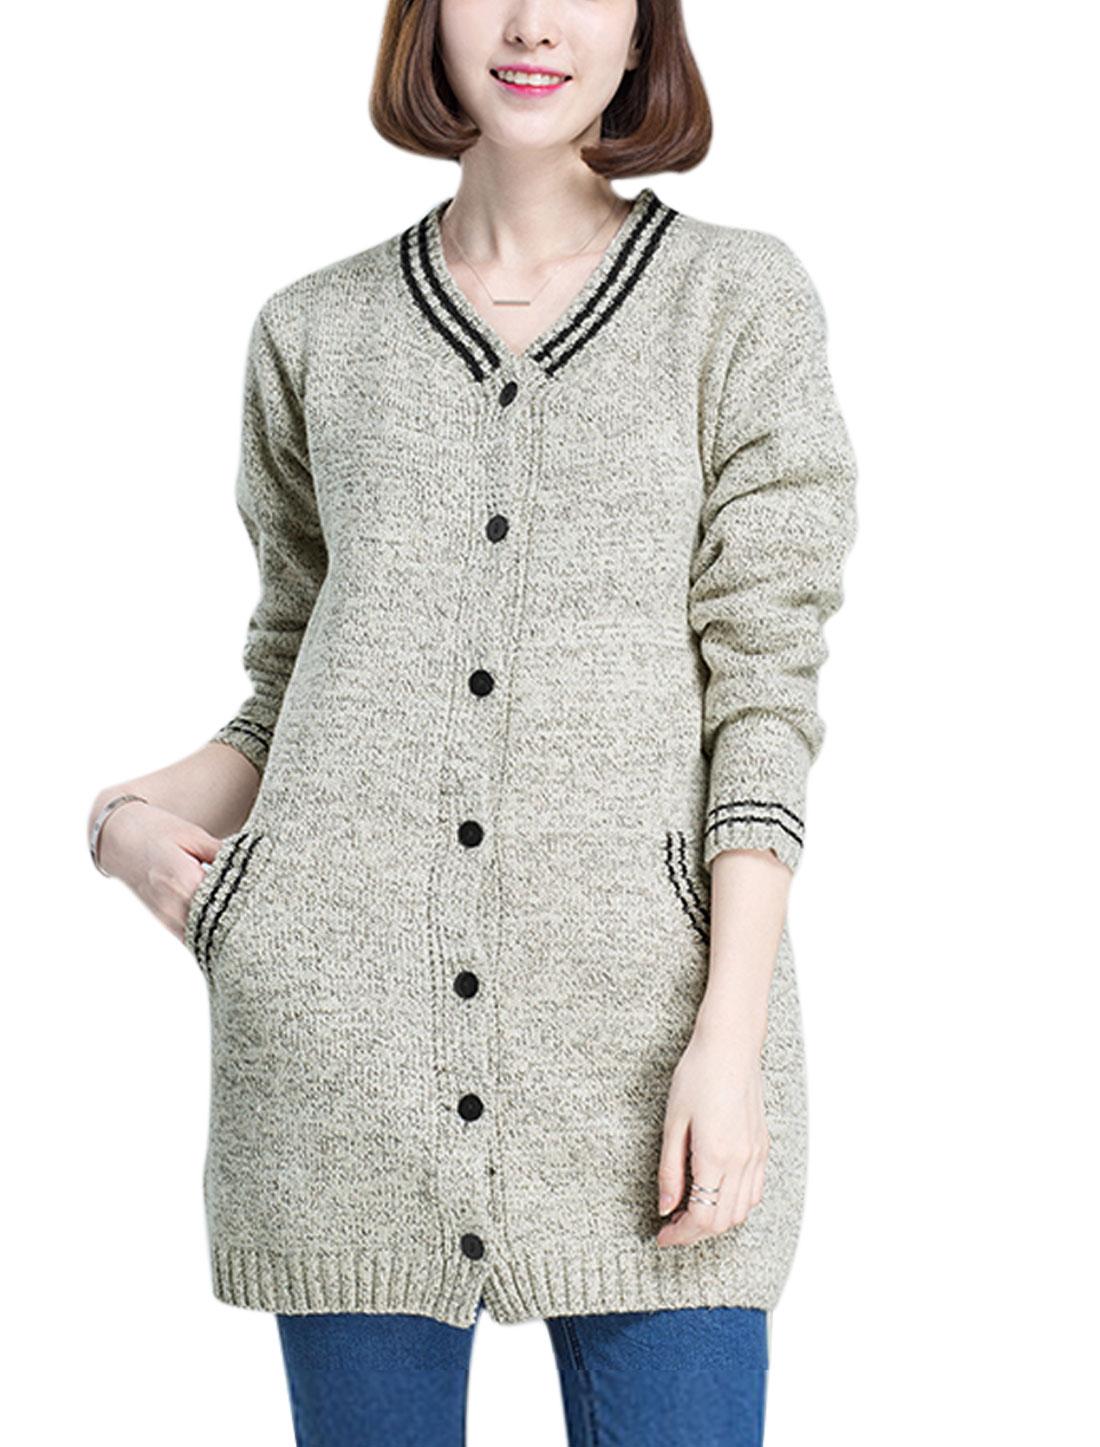 Women V Neck Single Breasted Two Slant Pockets Tunic Sweatercoat Light Gray S